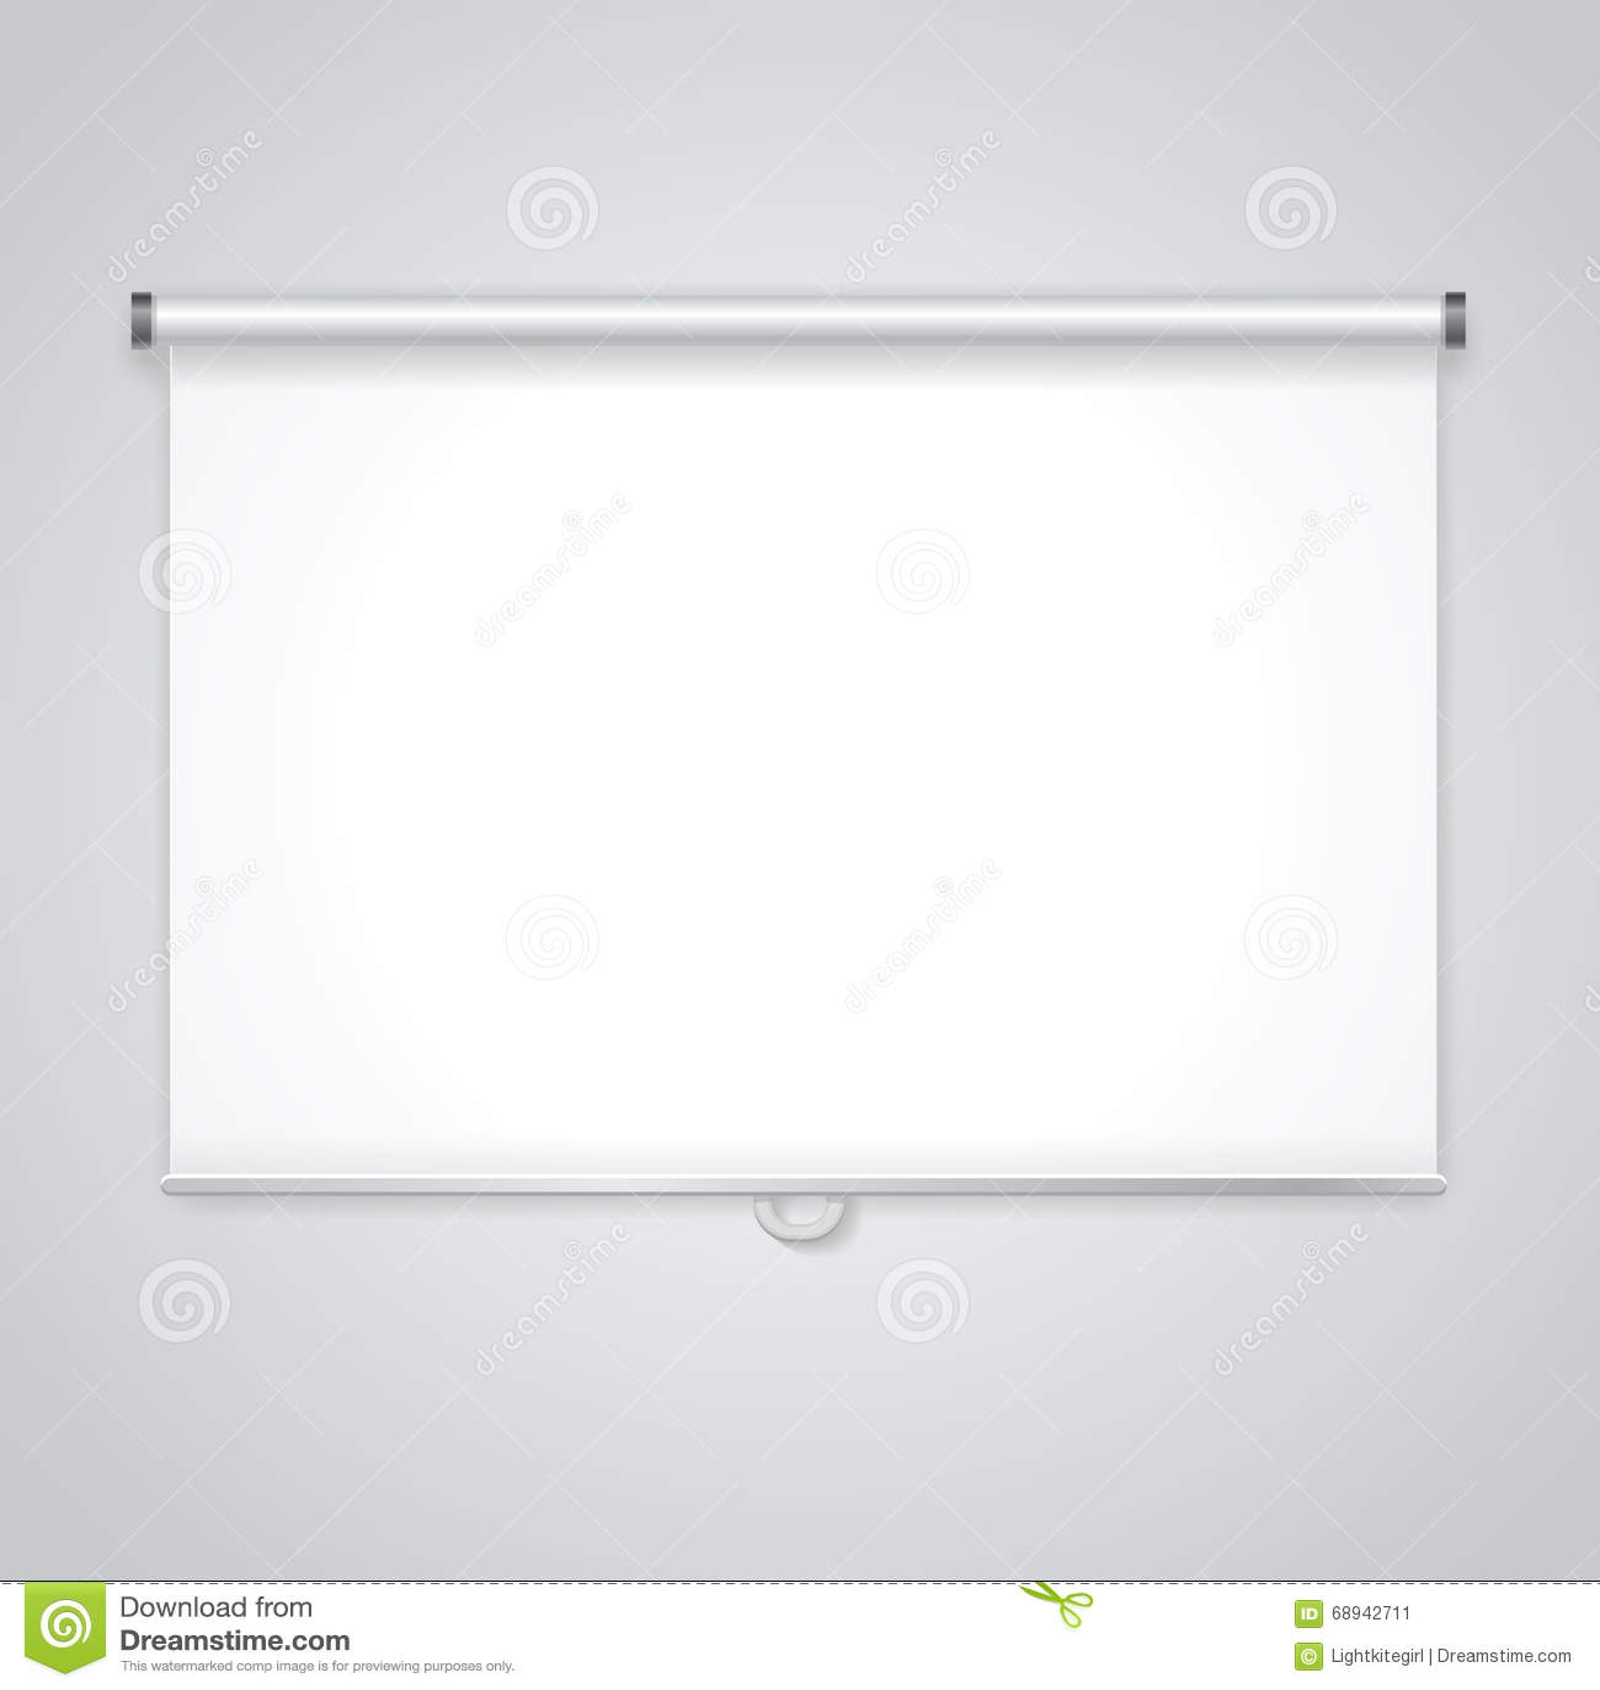 white board paper - Karawang